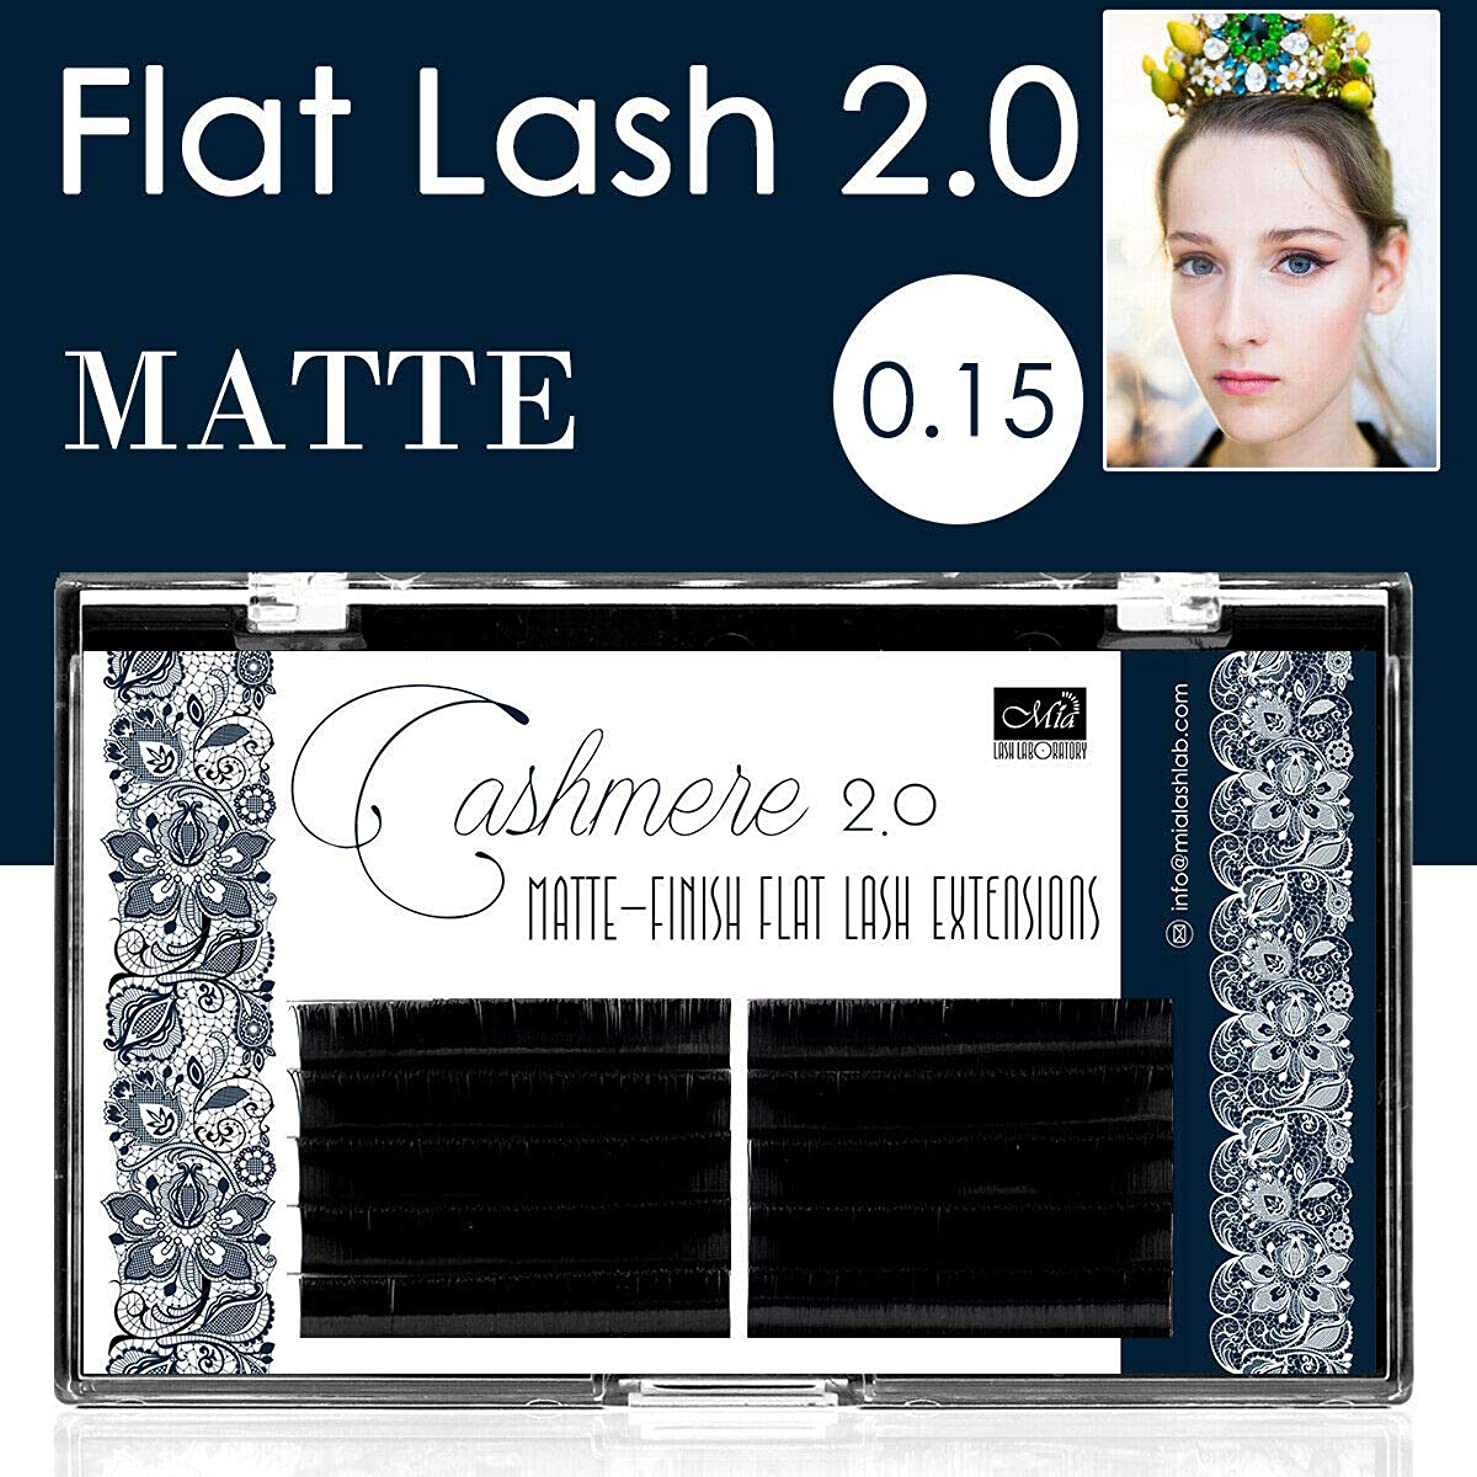 [0.15 C 14mm] MATTE Flat Lash X-Wrap Luxury Individual Eyelash Extensions for Salon Low Tack Tape Light